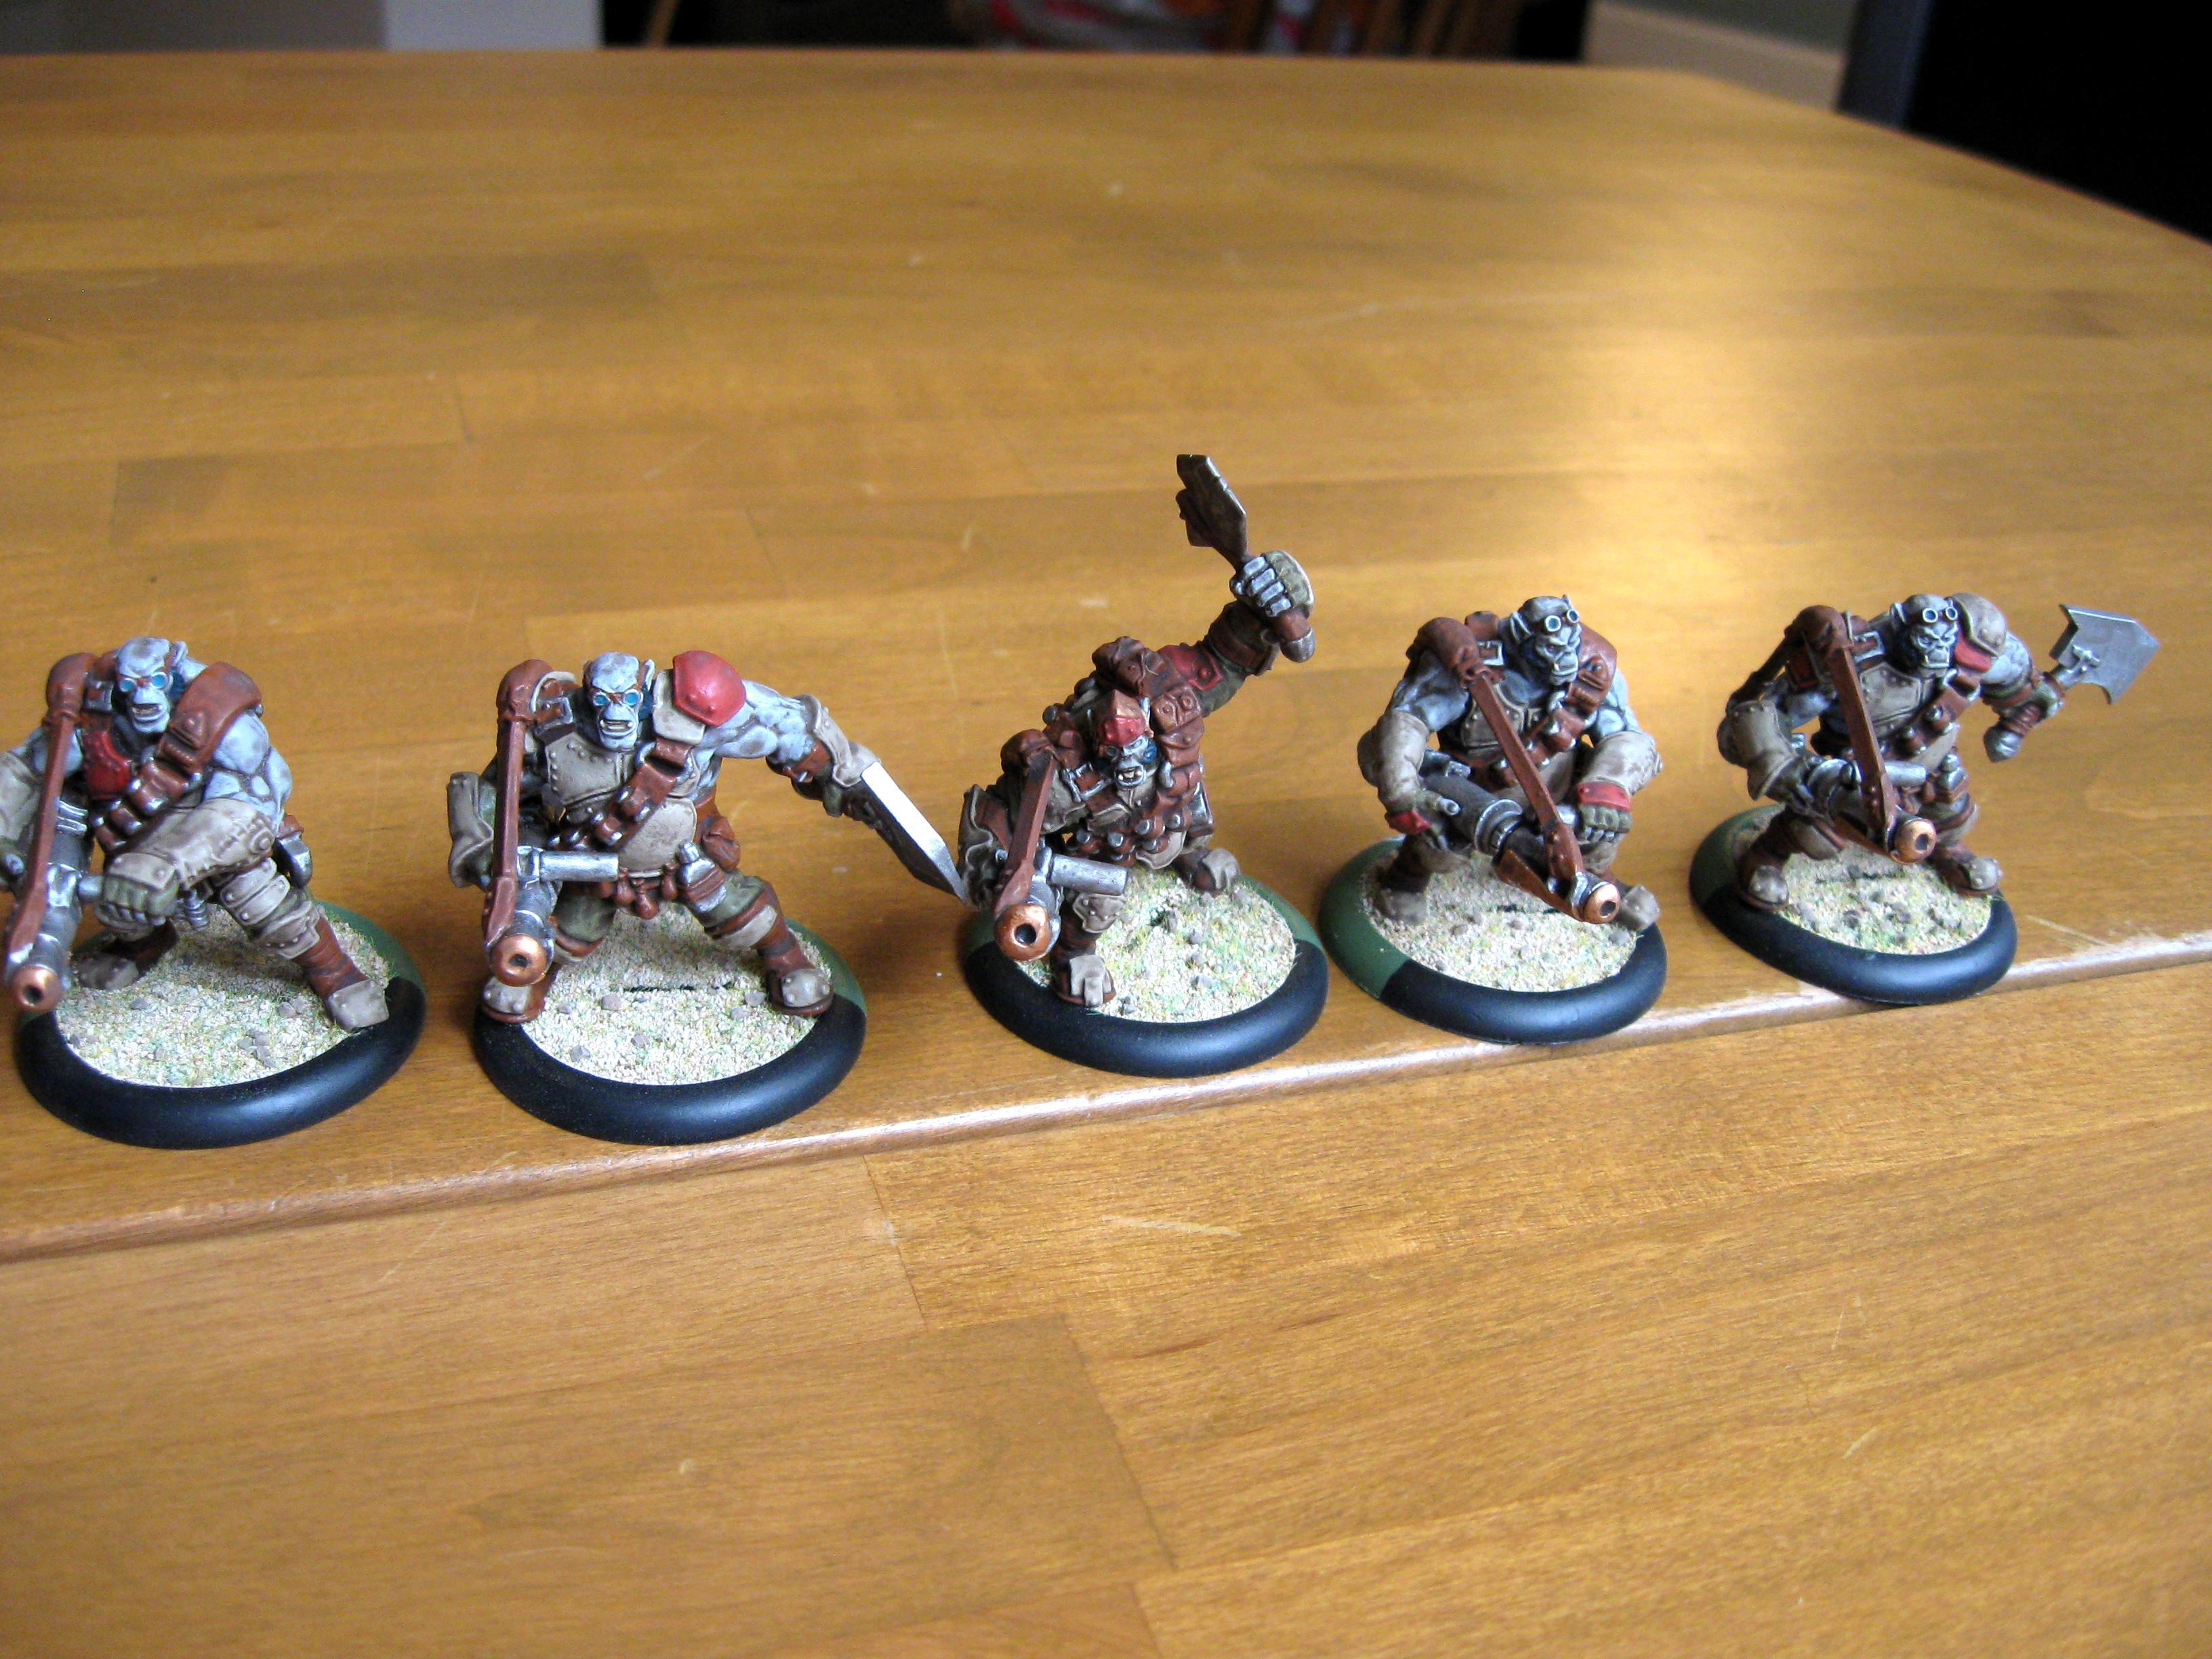 Dwarves, Mercenary, Ogrun, Privateer Press, Rhul, Searforge, Warmachine